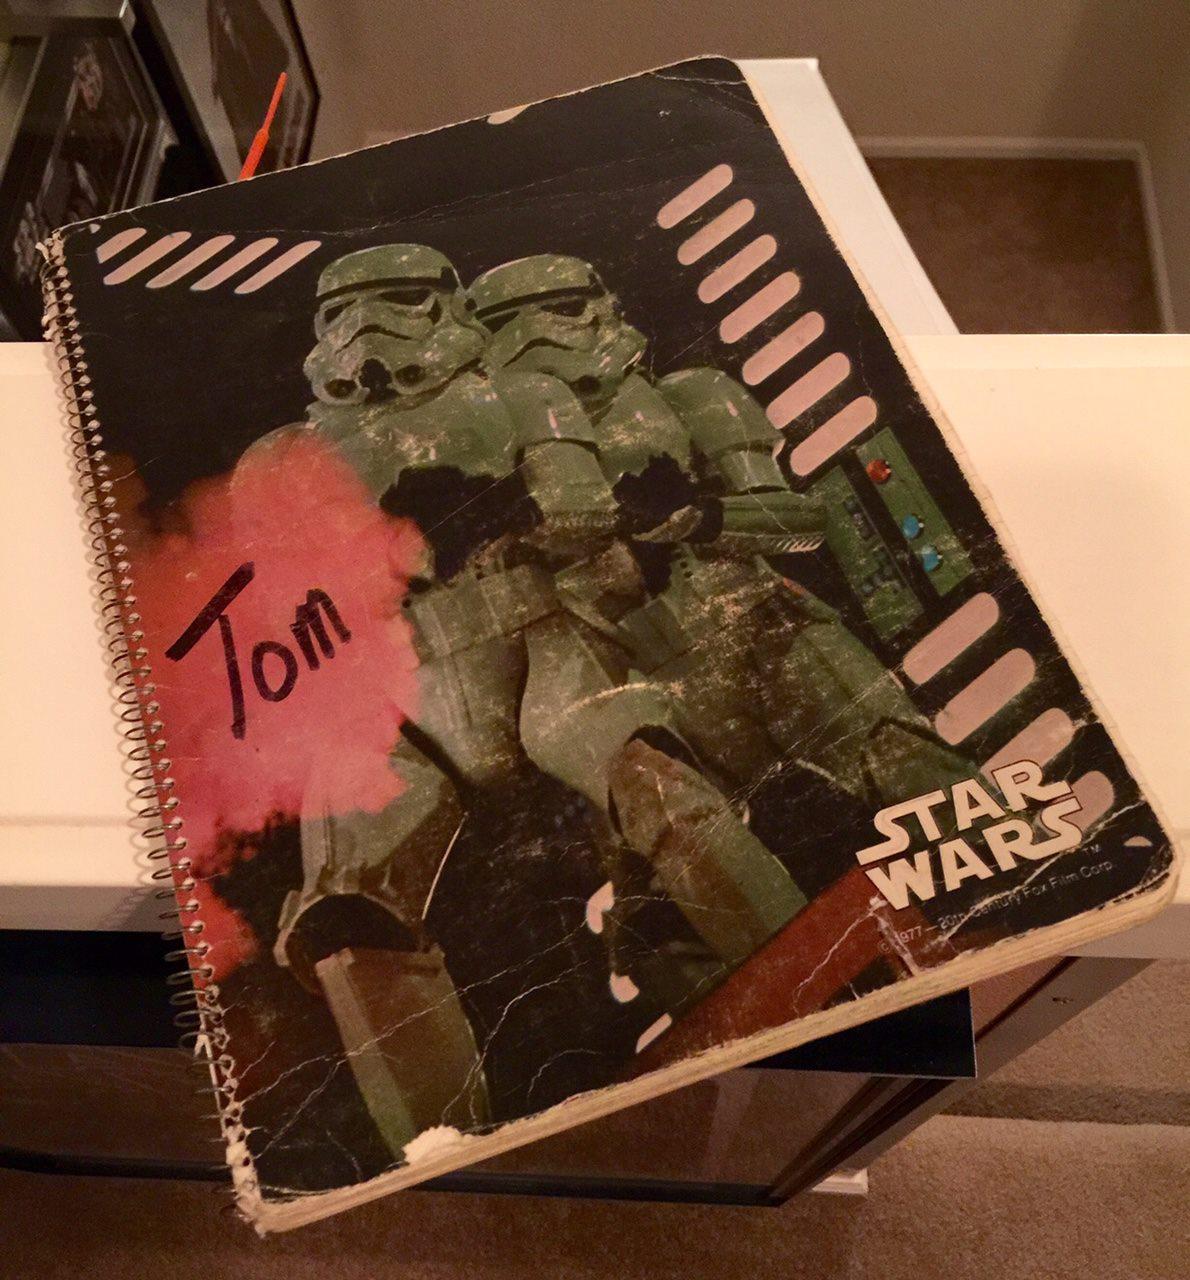 theswca blog scrapbooking star wars part 2 homework. Black Bedroom Furniture Sets. Home Design Ideas